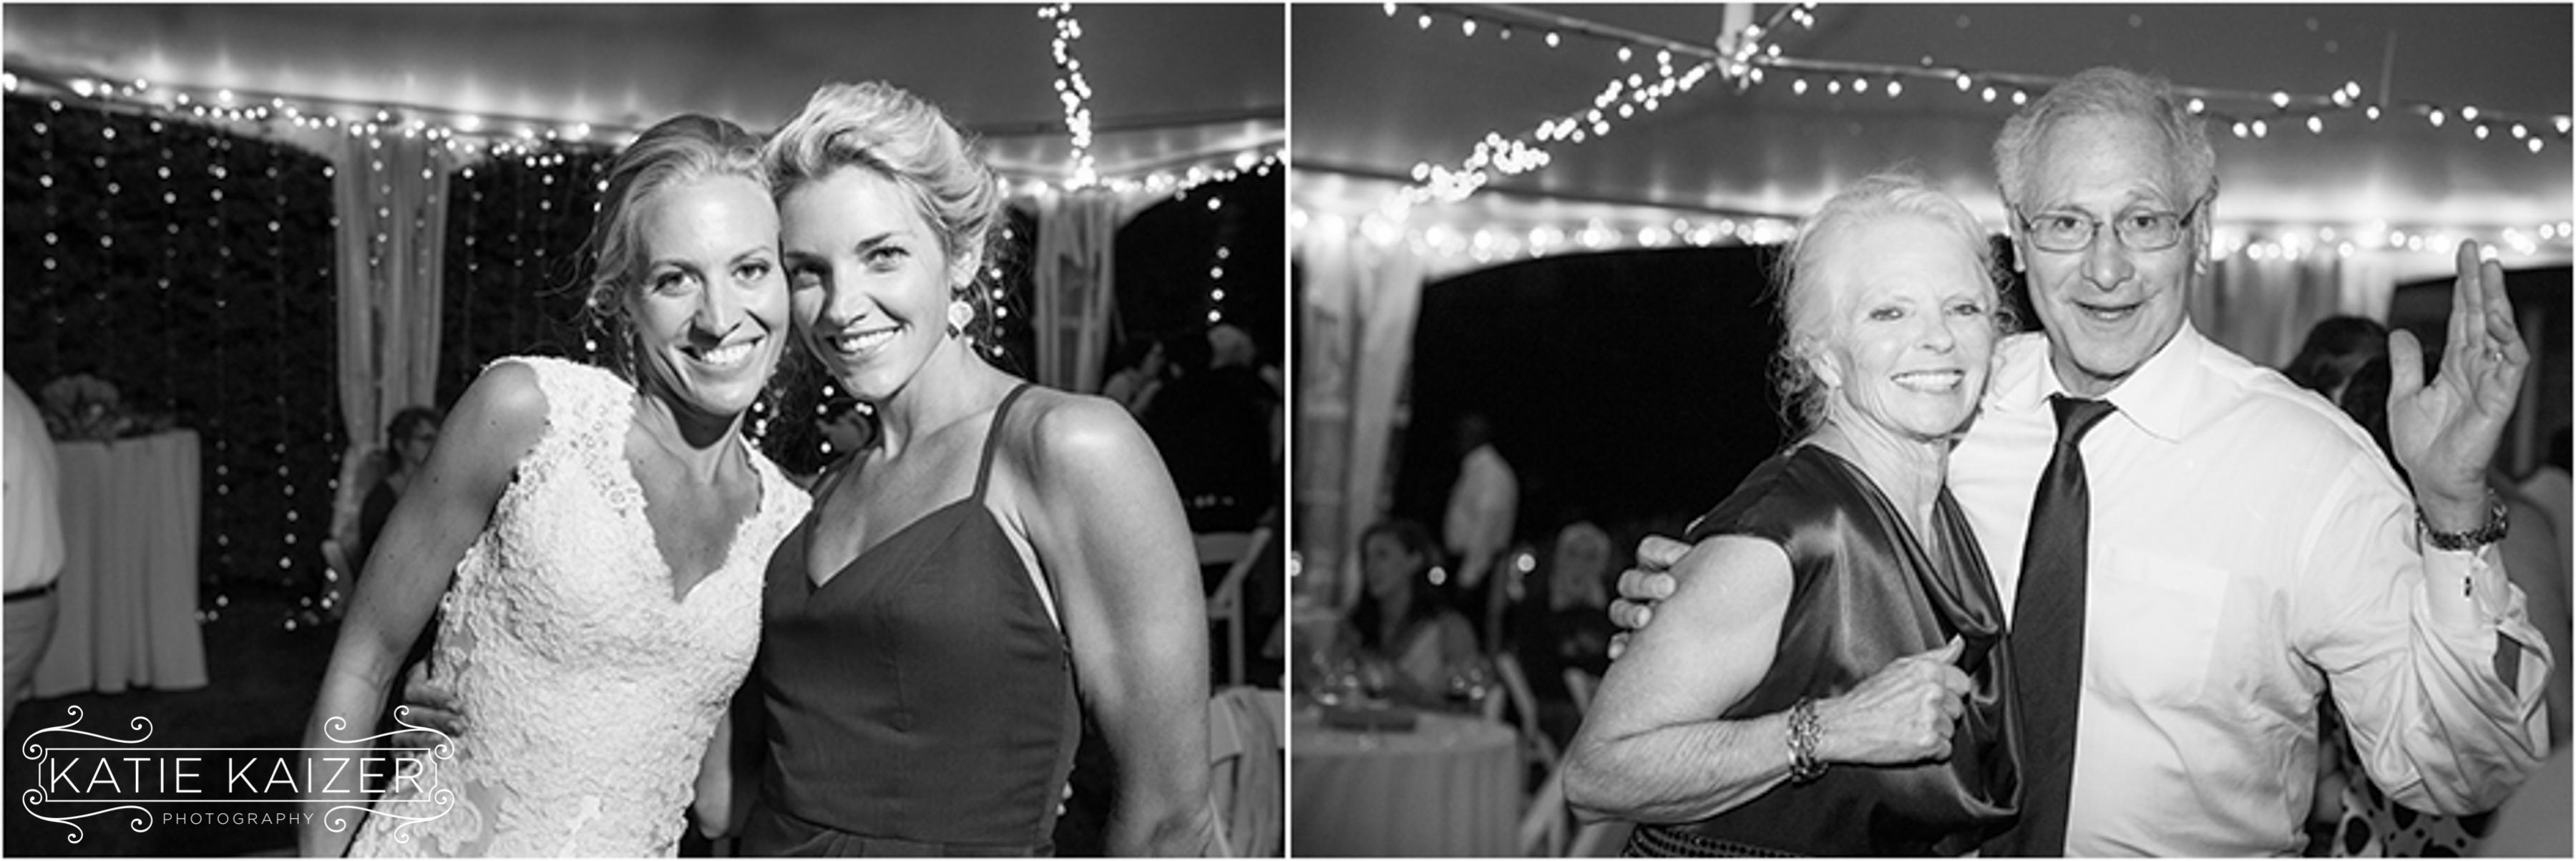 Caitlin&Mark_126_KatieKaizerPhotography